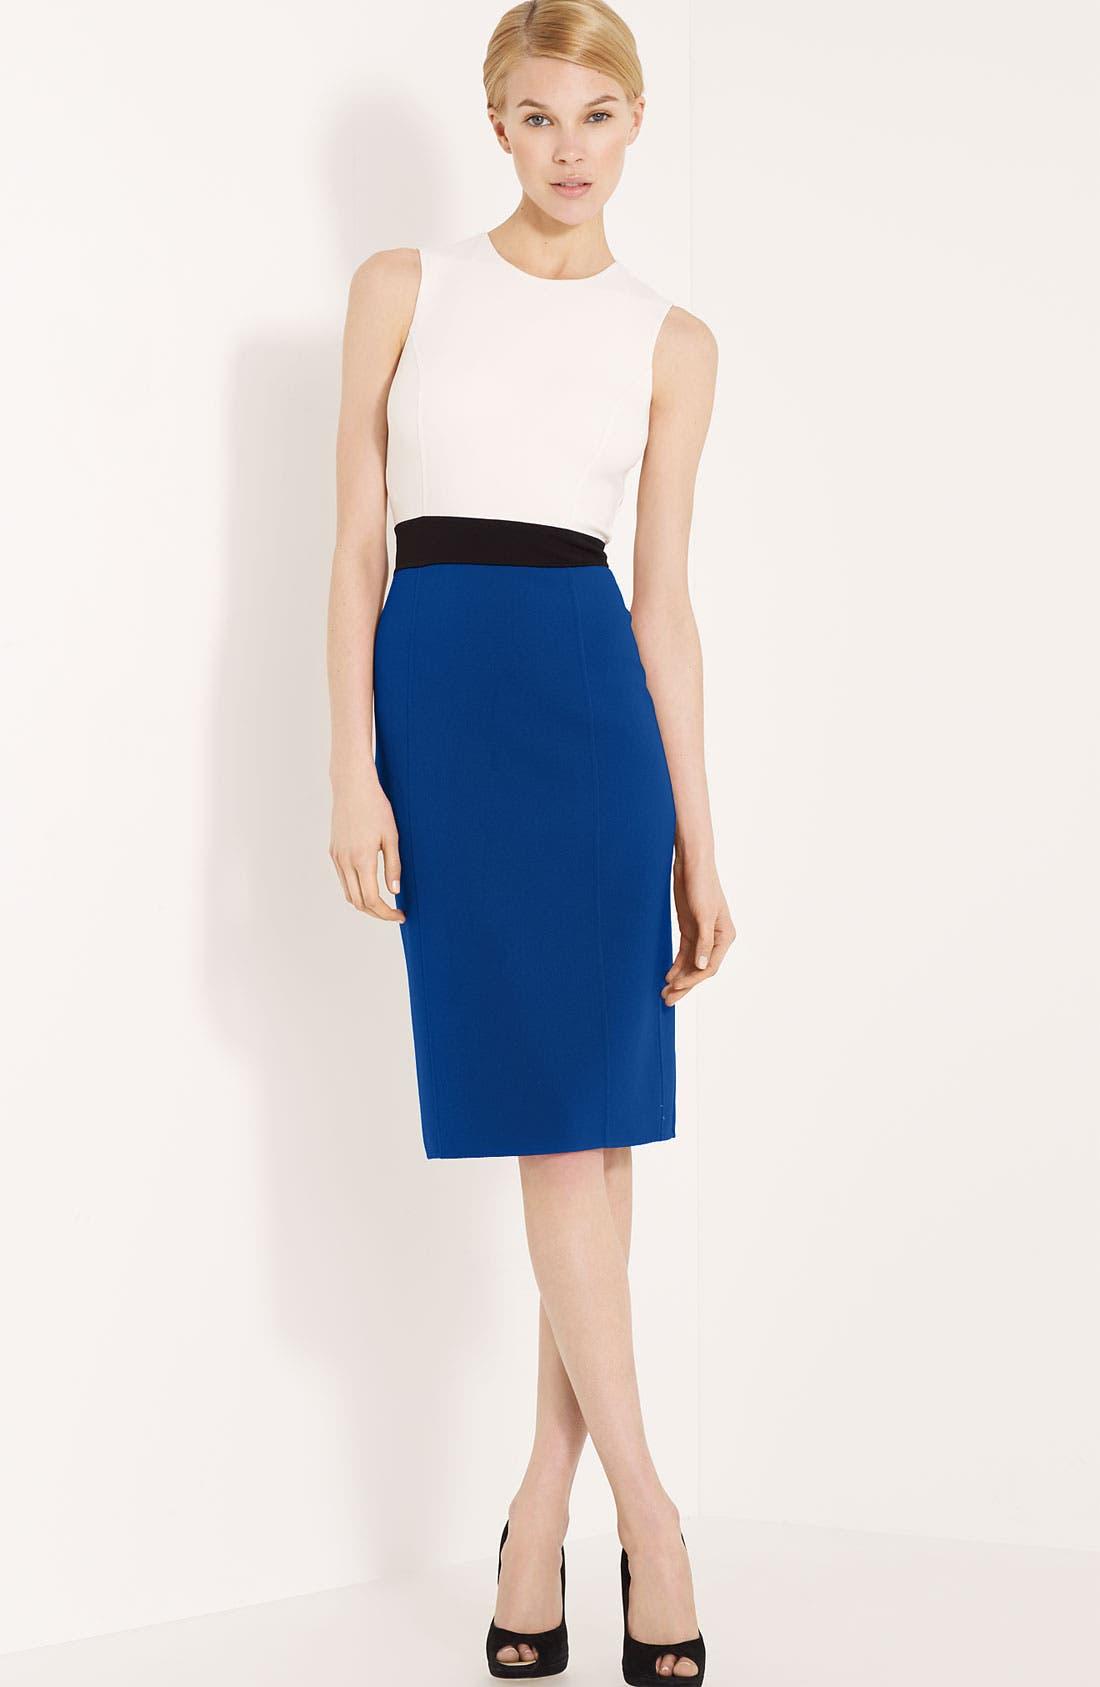 Main Image - Michael Kors Colorblock Stretch Wool Crepe Dress